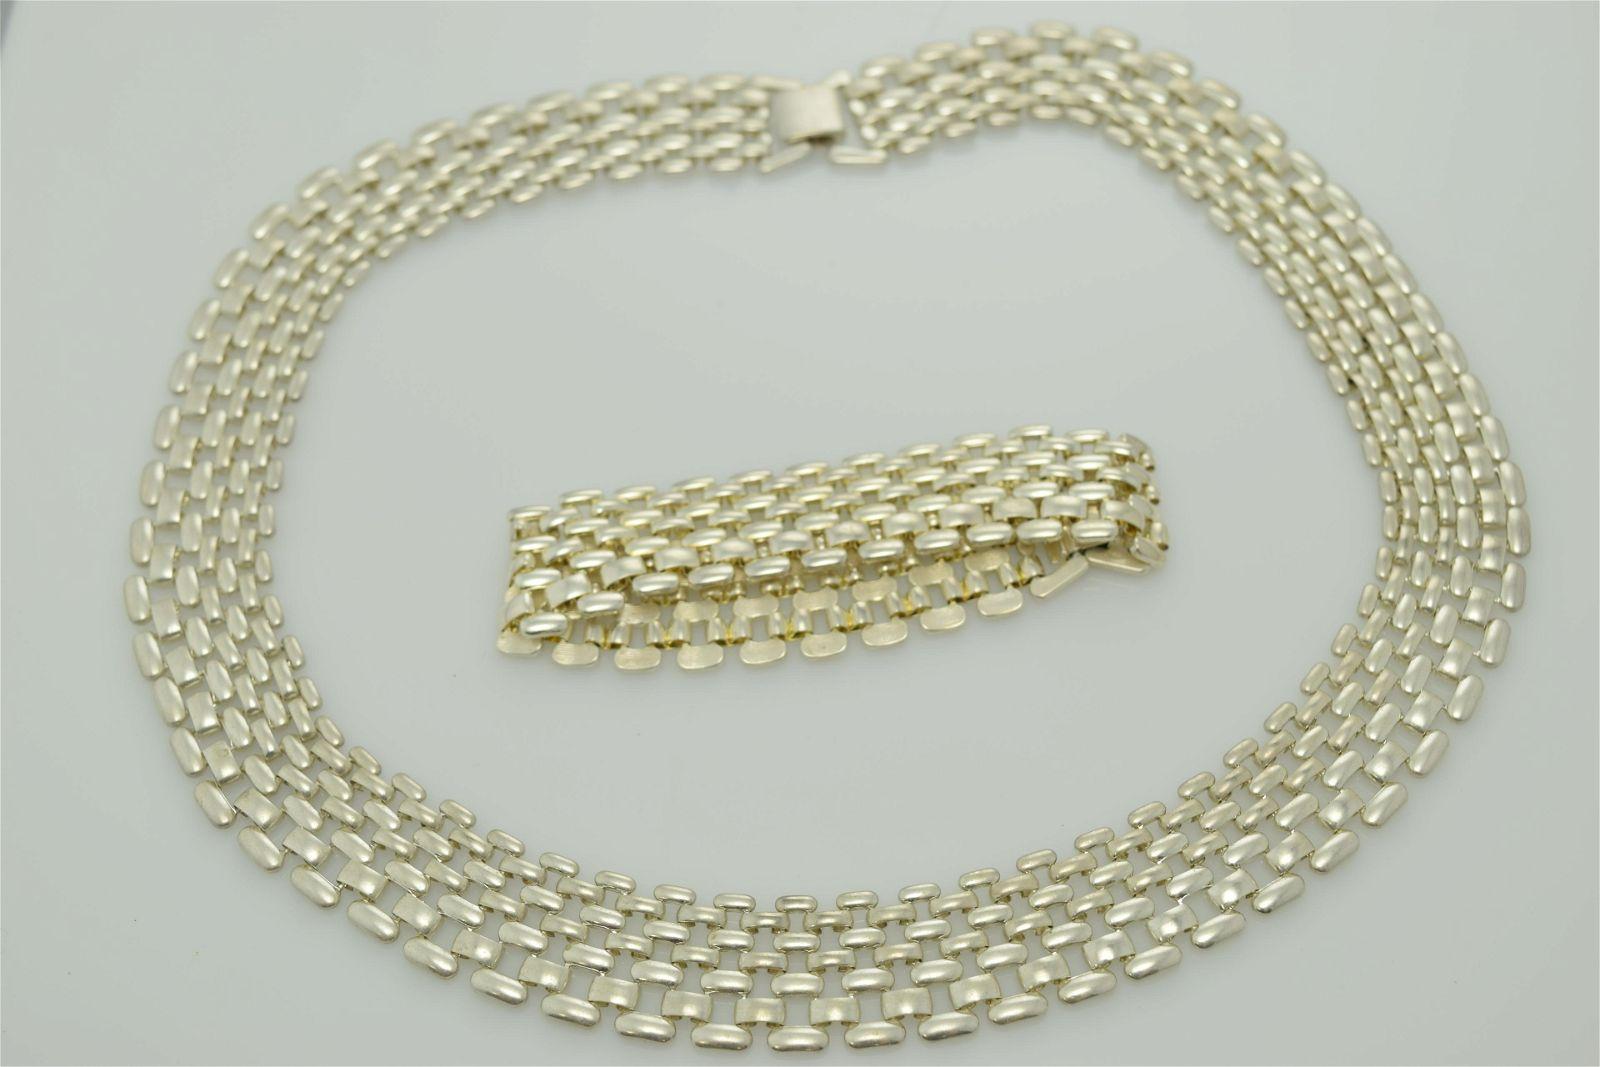 A silver tone necklace and bracelet set.